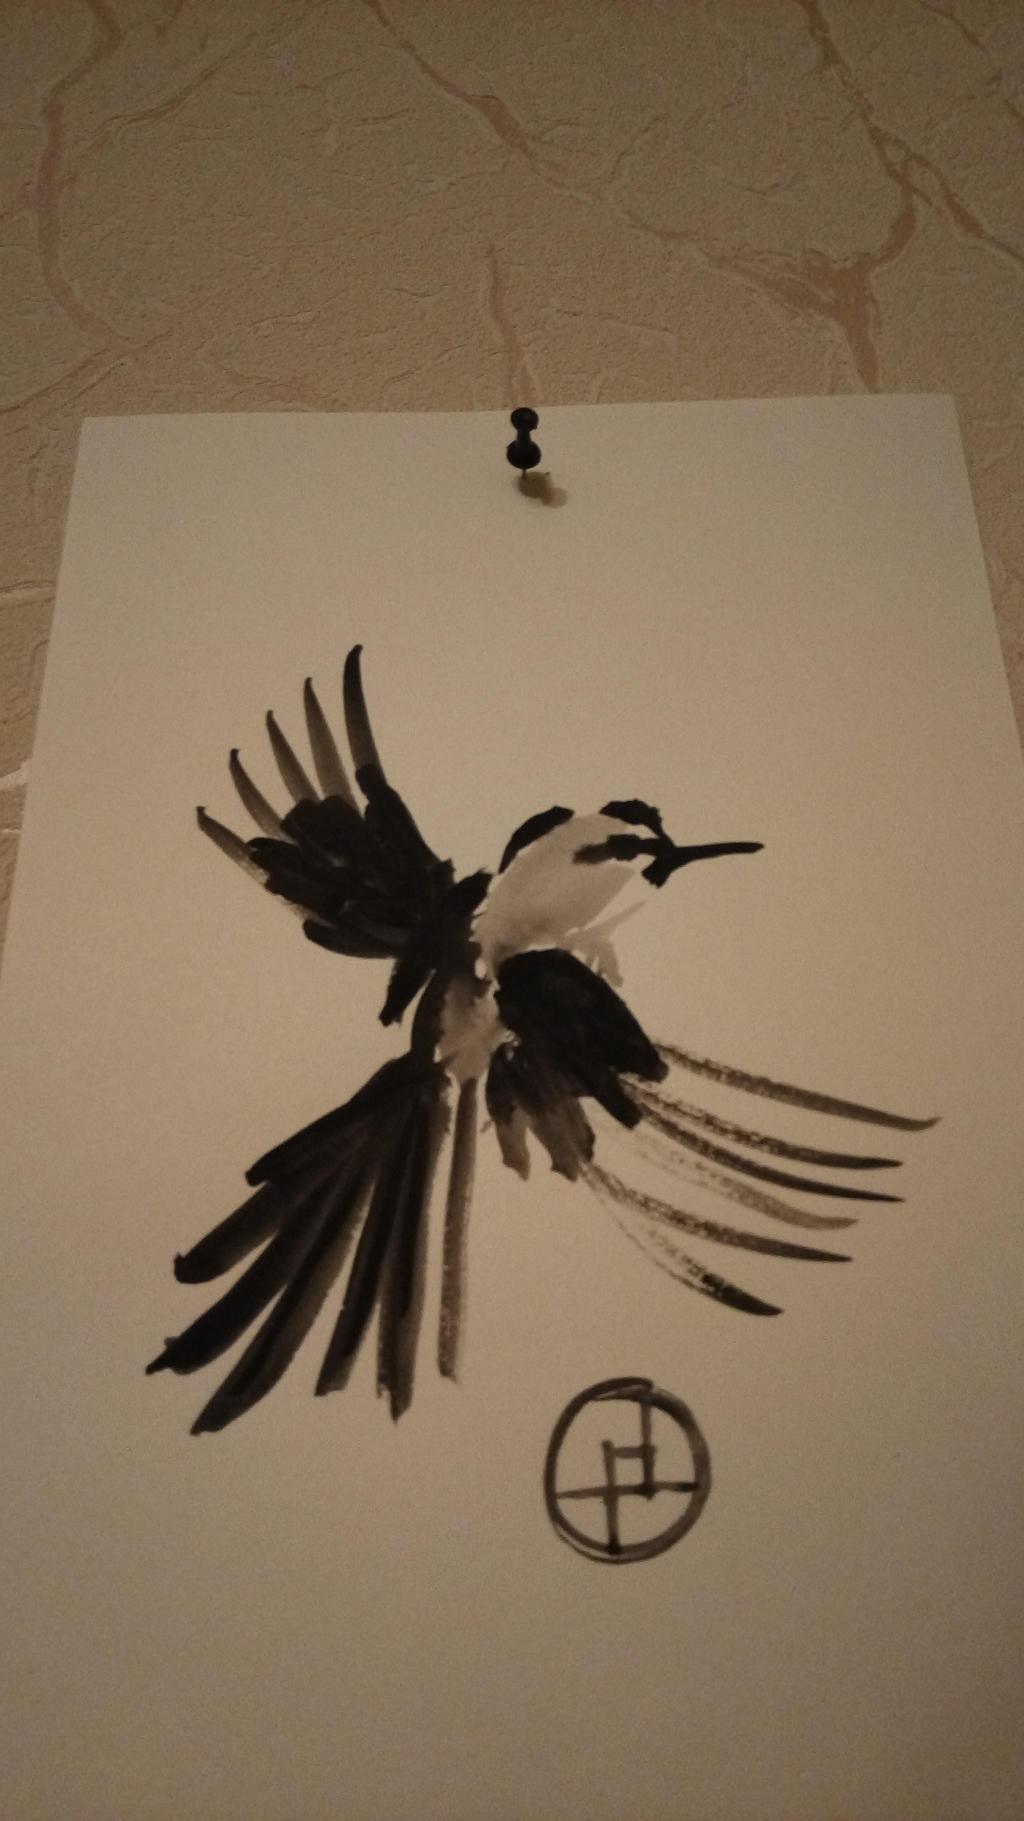 Colibre by tarotribe